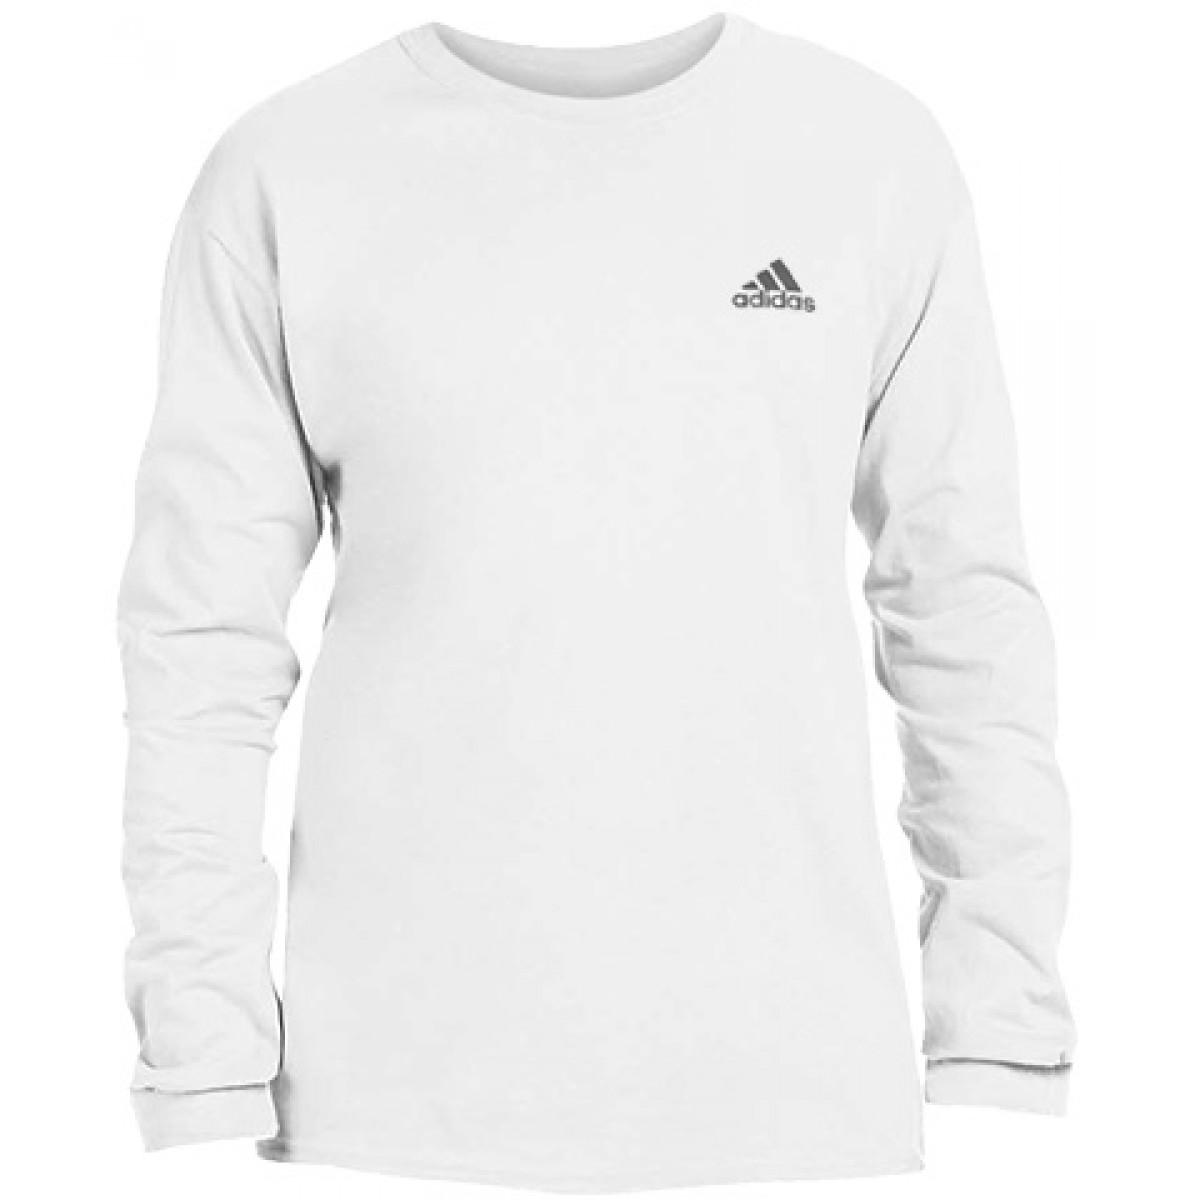 Men's Ultimate Long Sleeve Adidas Crew Tee-White-XS